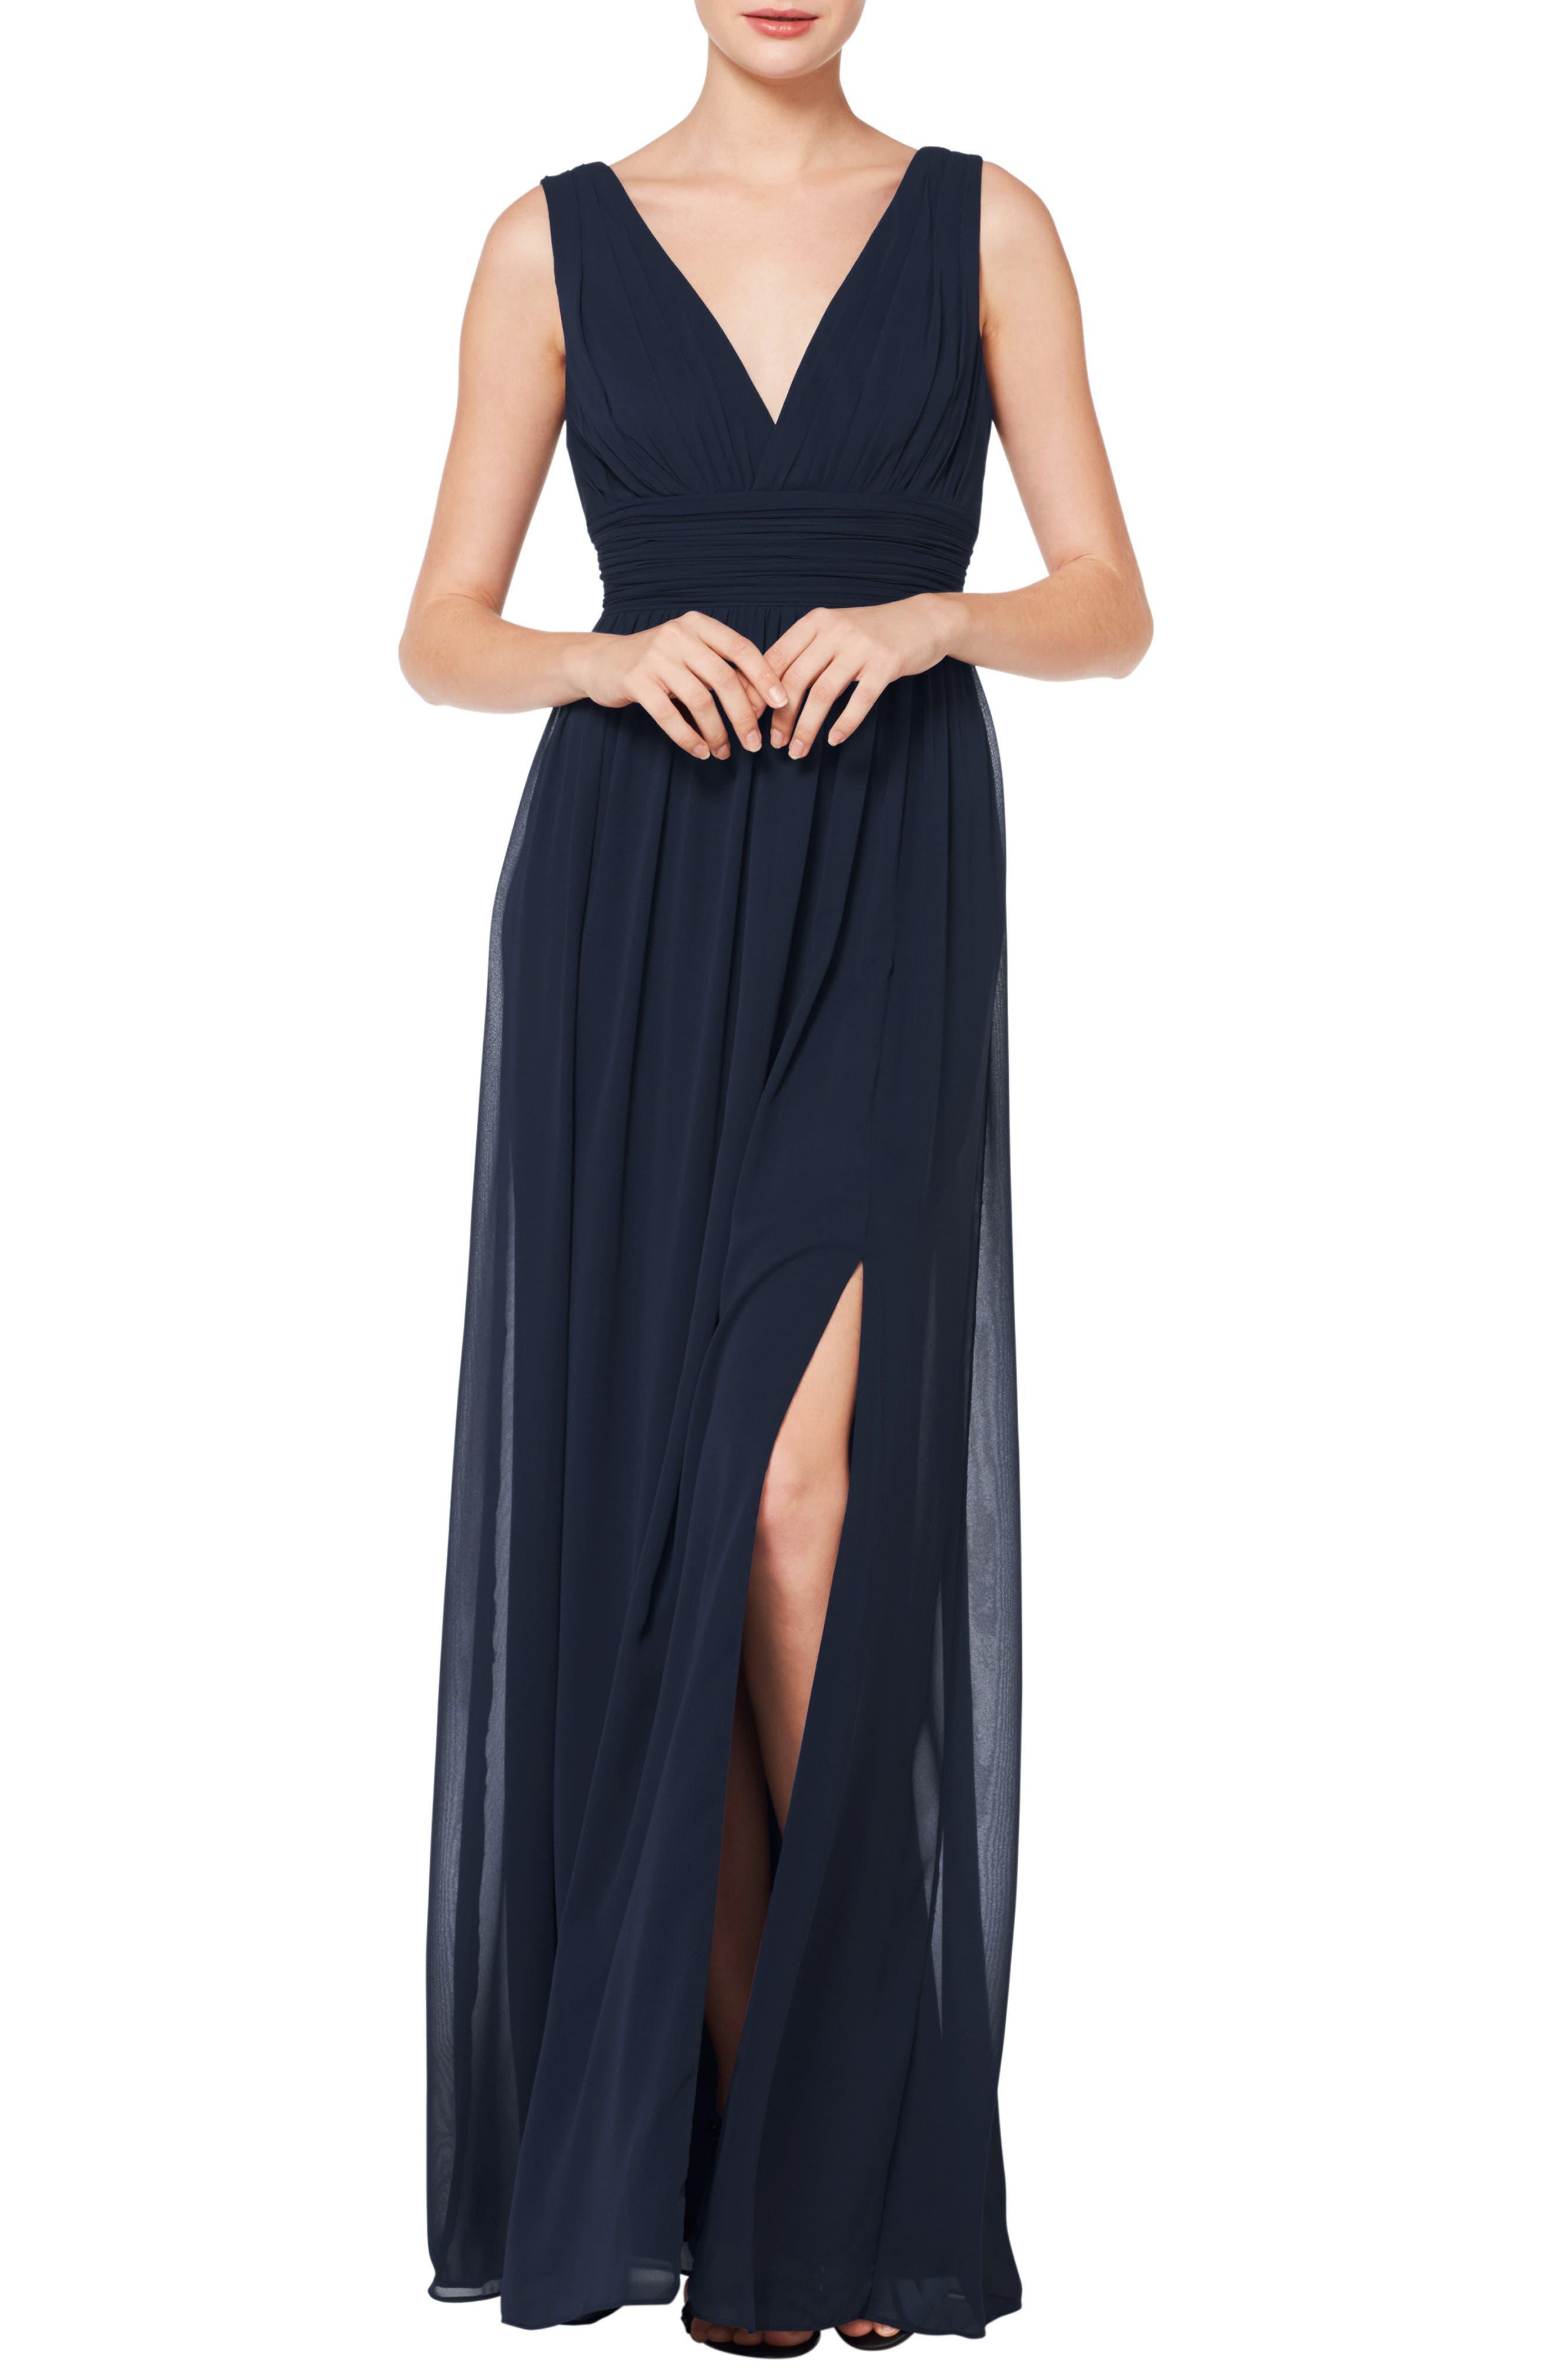 #LEVKOFF, V-Neck Pleated Chiffon Evening Dress, Main thumbnail 1, color, NAVY